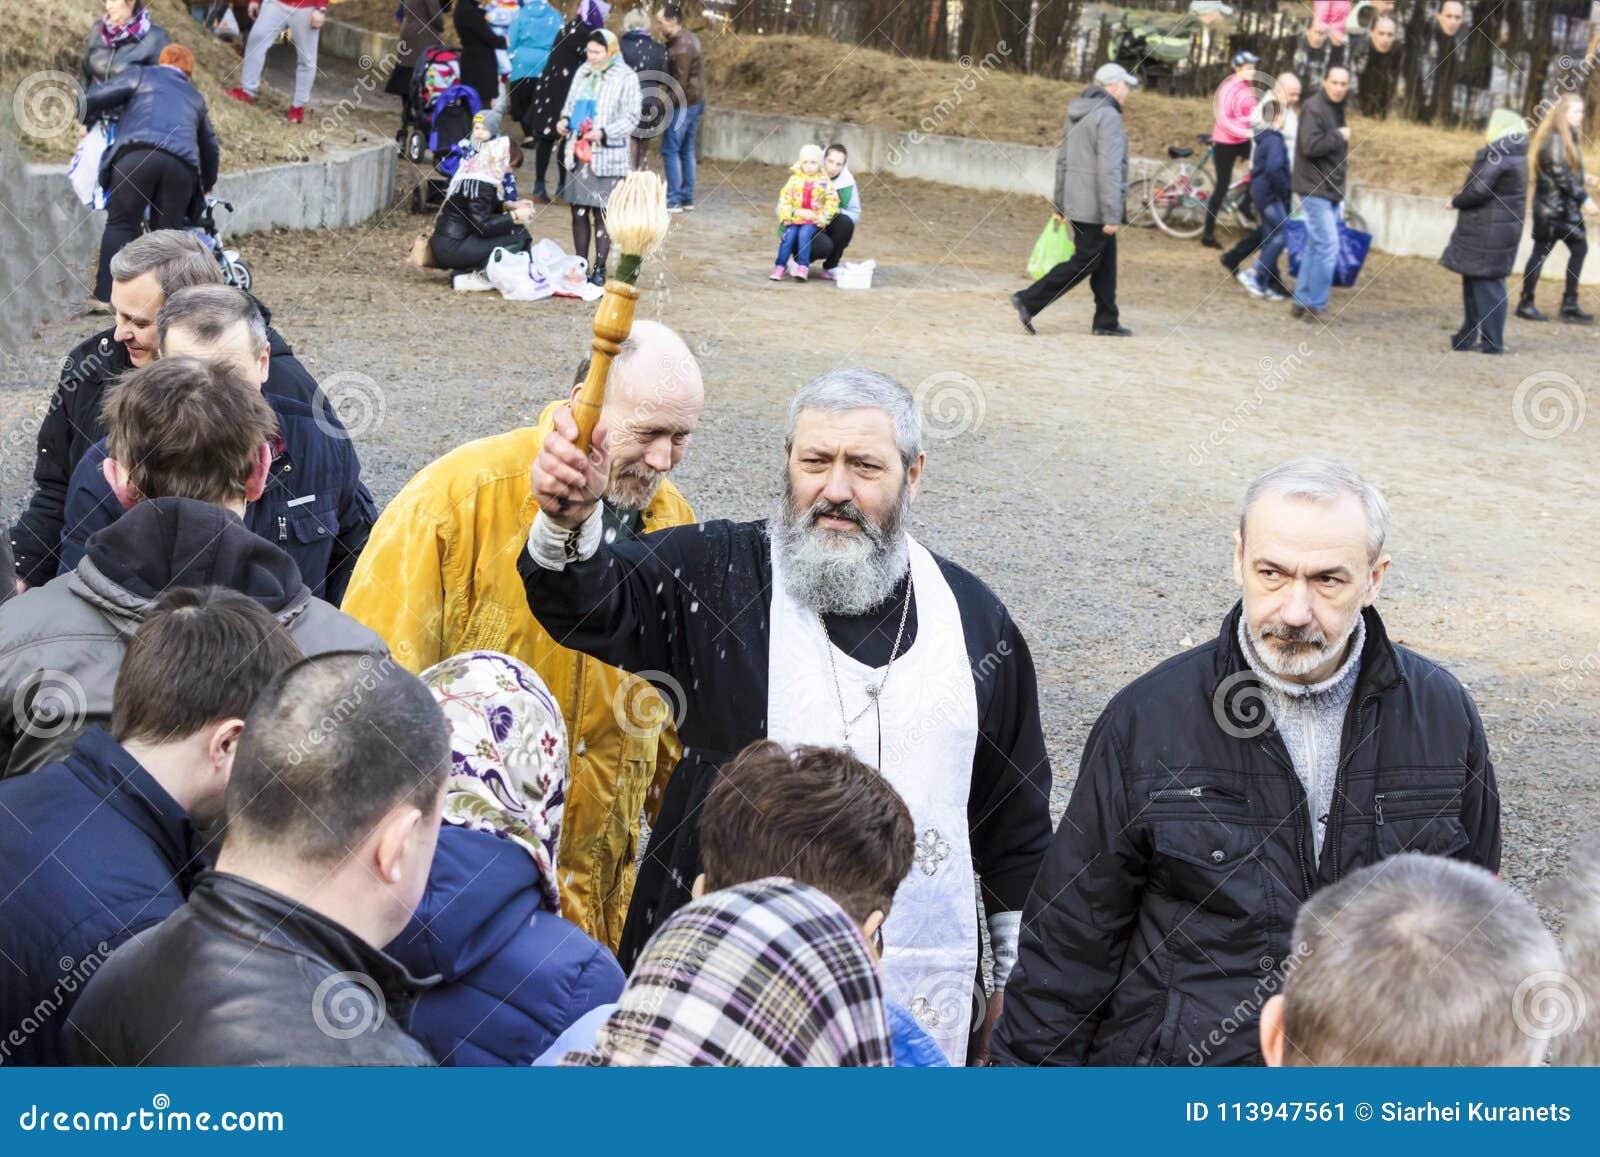 Minsk. Belarus. Kolodischi. April 7, 2018. Consecration of Easter cakes in the church. Easter Eve